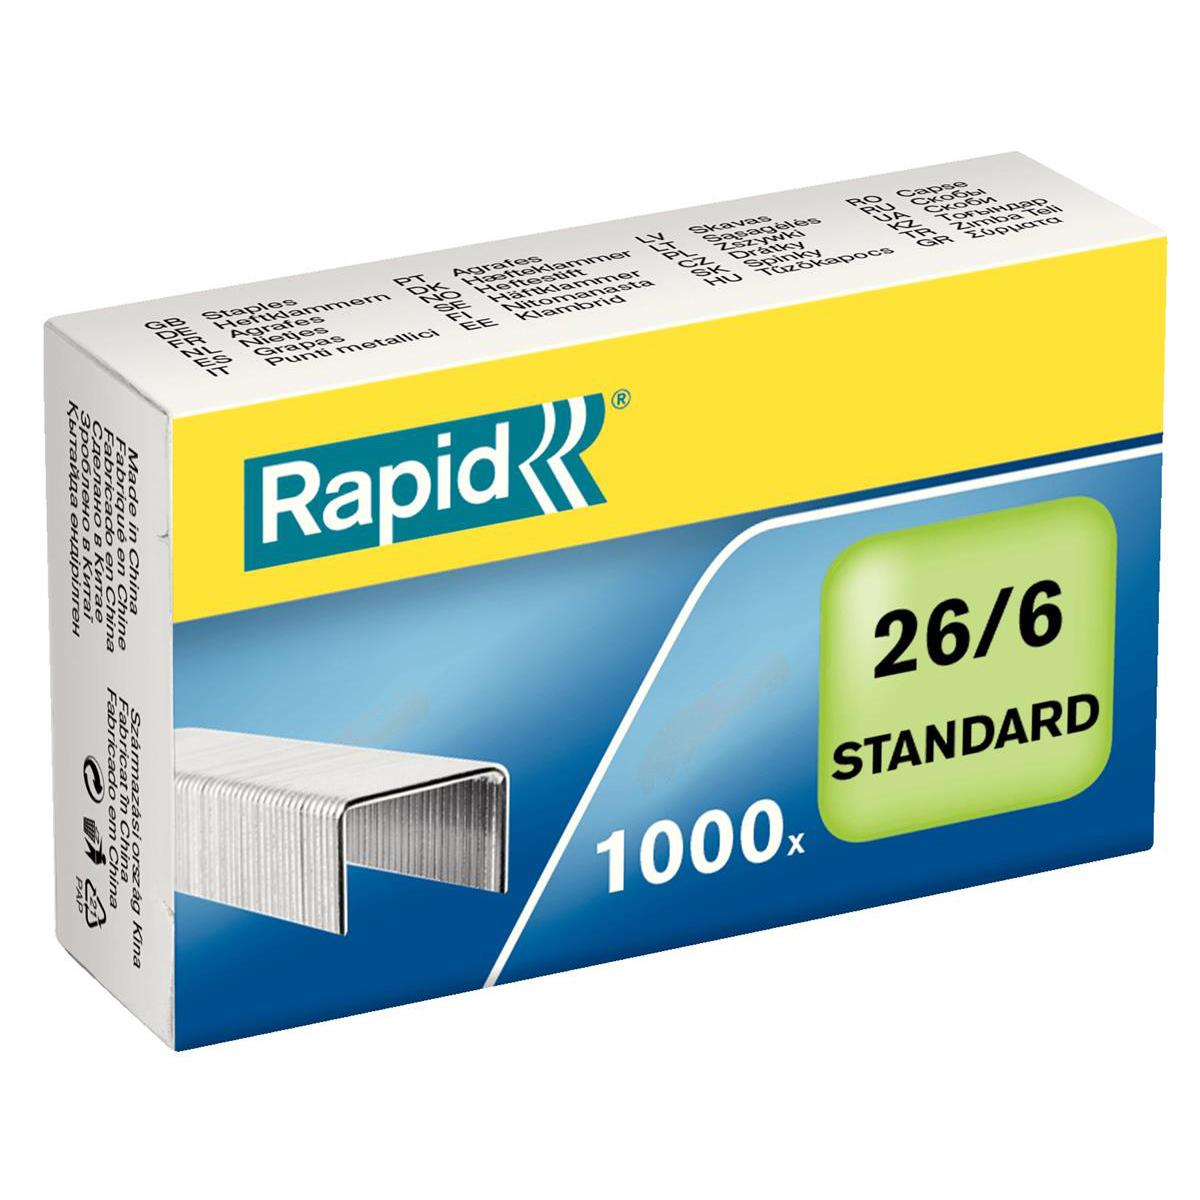 Rapid Staples 26/6mm Pack 1000 Ref 24861300